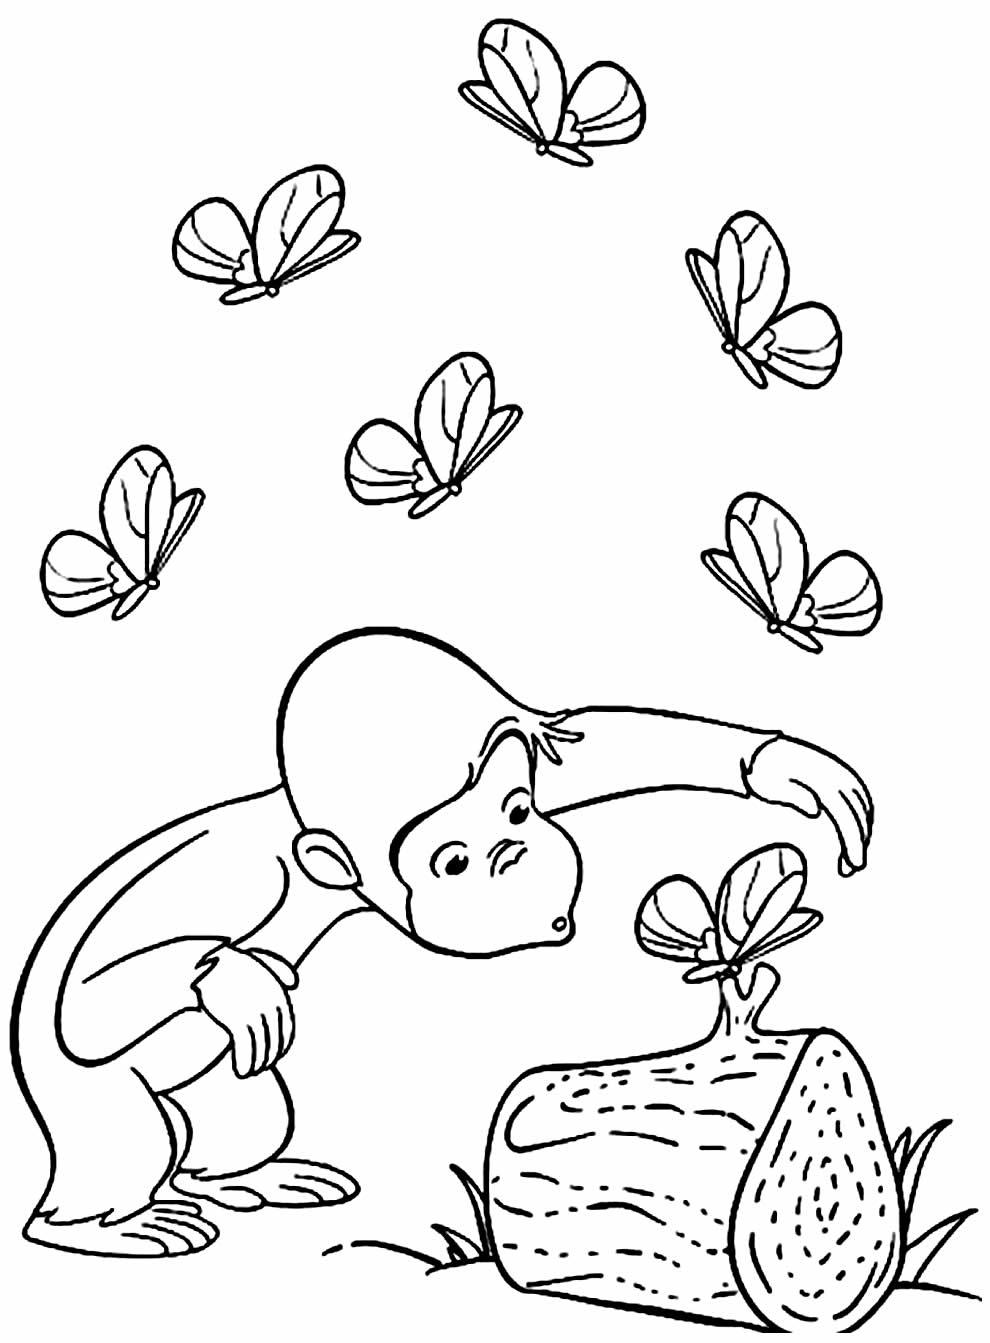 Desenho de macaco para pintar